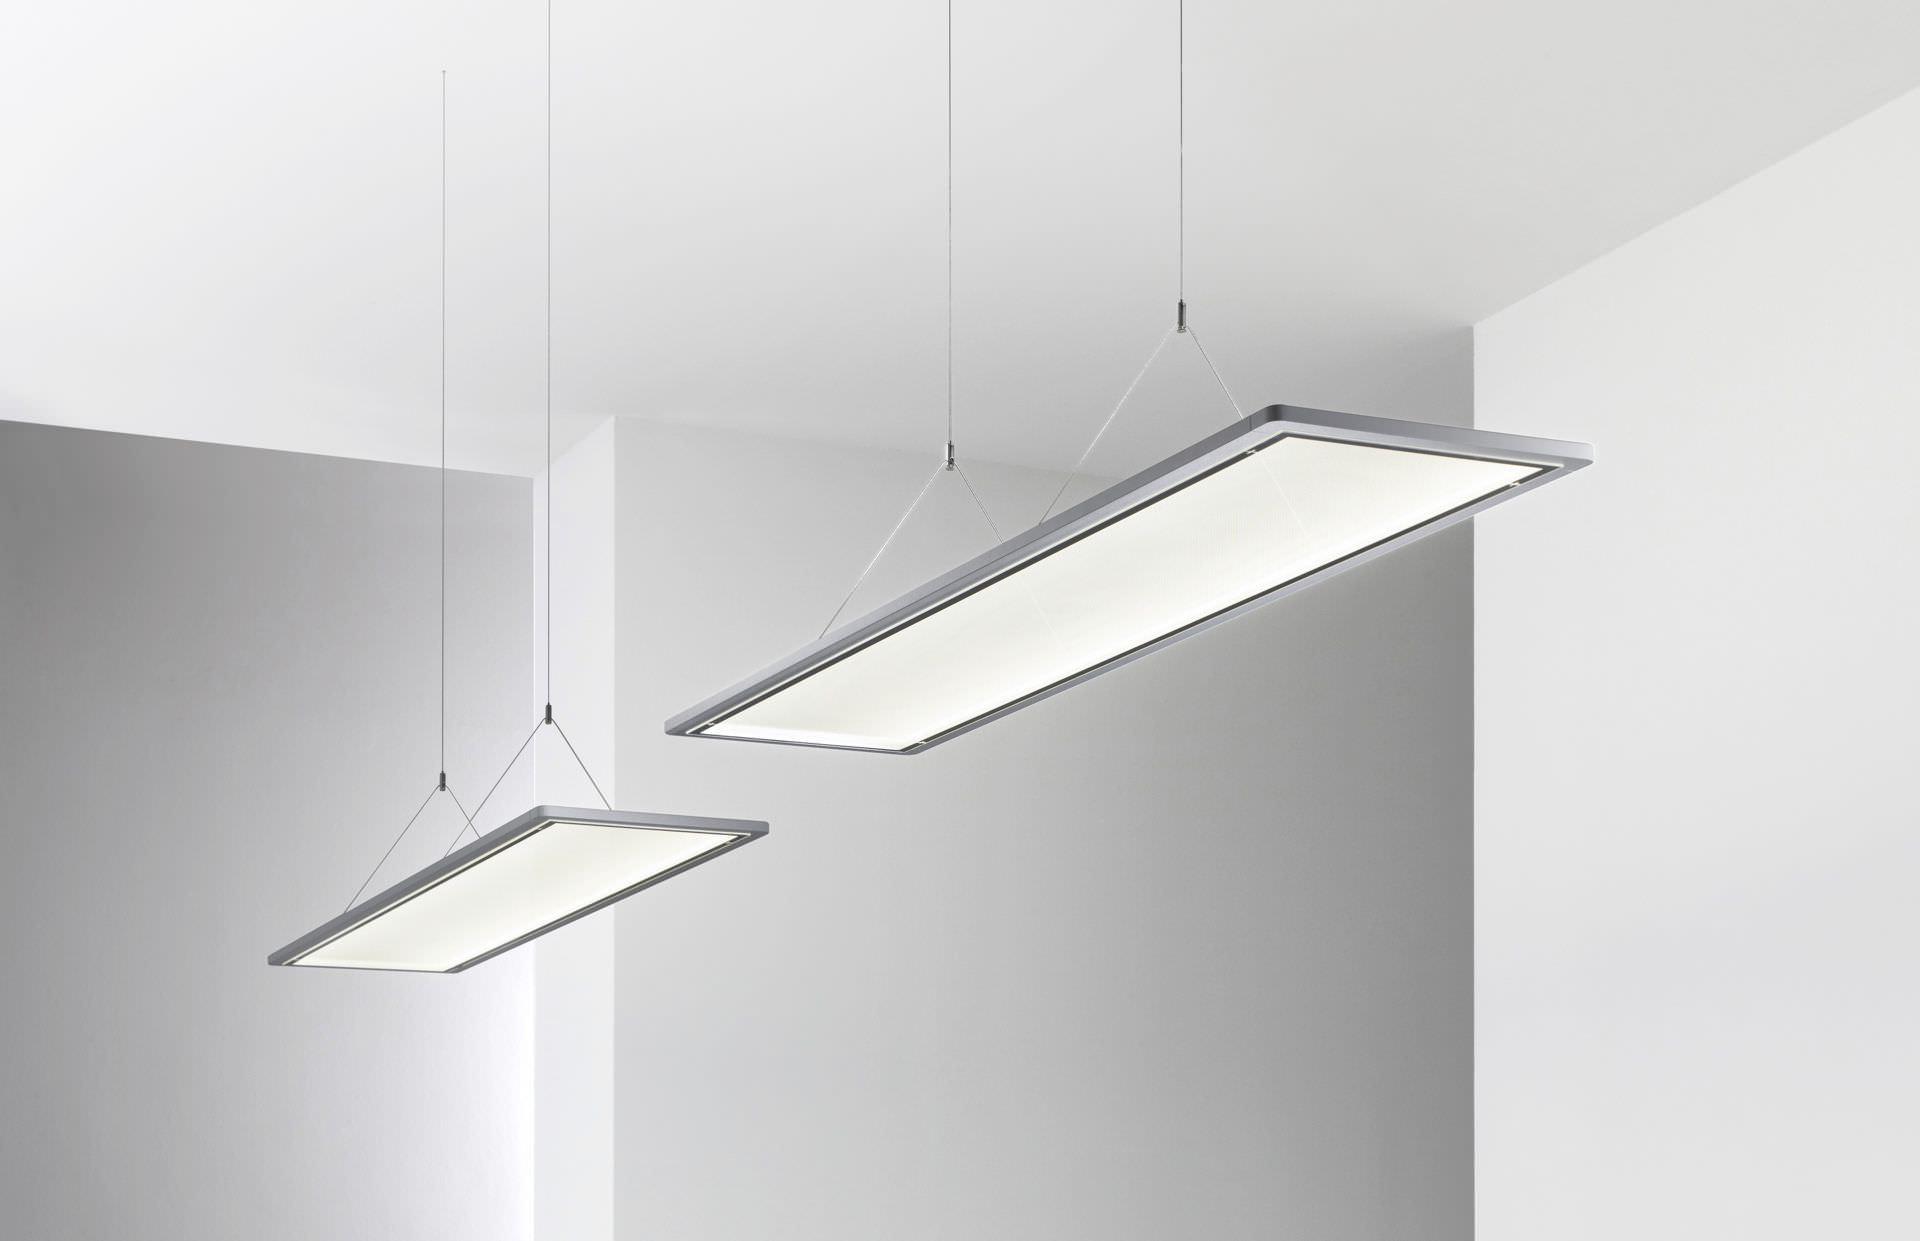 Rectangular light fixtures light fixtures rectangular light fixture fixtures mozeypictures Choice Image